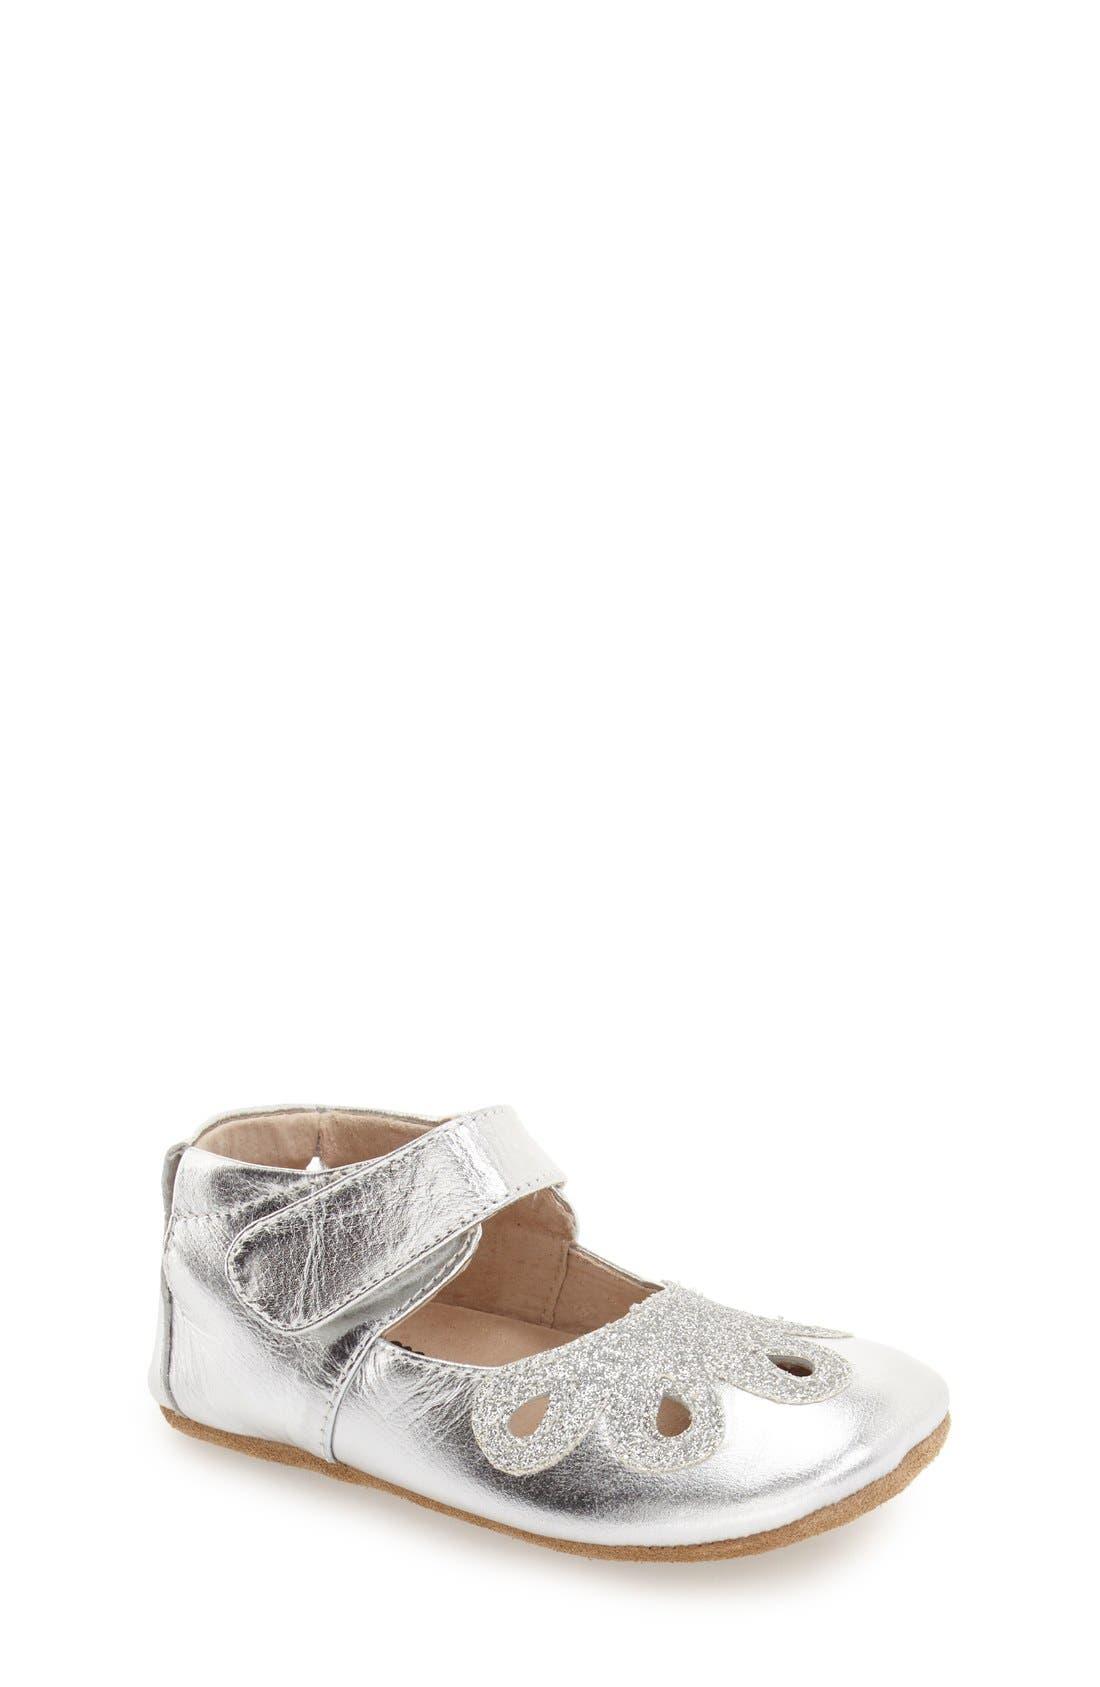 'Petal' Mary Jane Crib Shoe,                         Main,                         color,